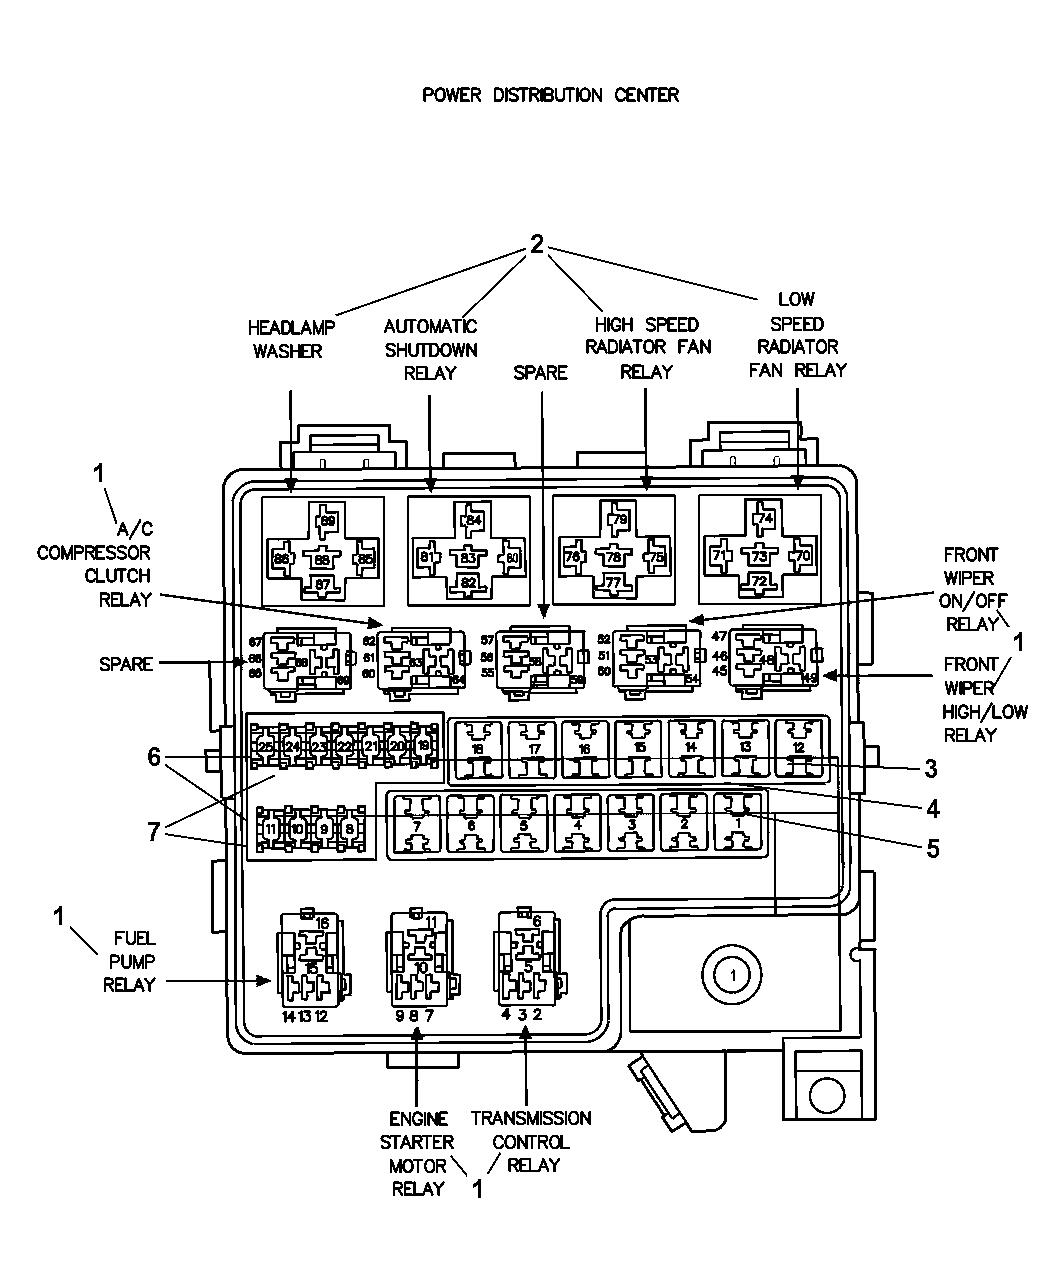 2001 dodge stratus sedan power distribution center relays 2001 Dodge Stratus Fuse Diagram